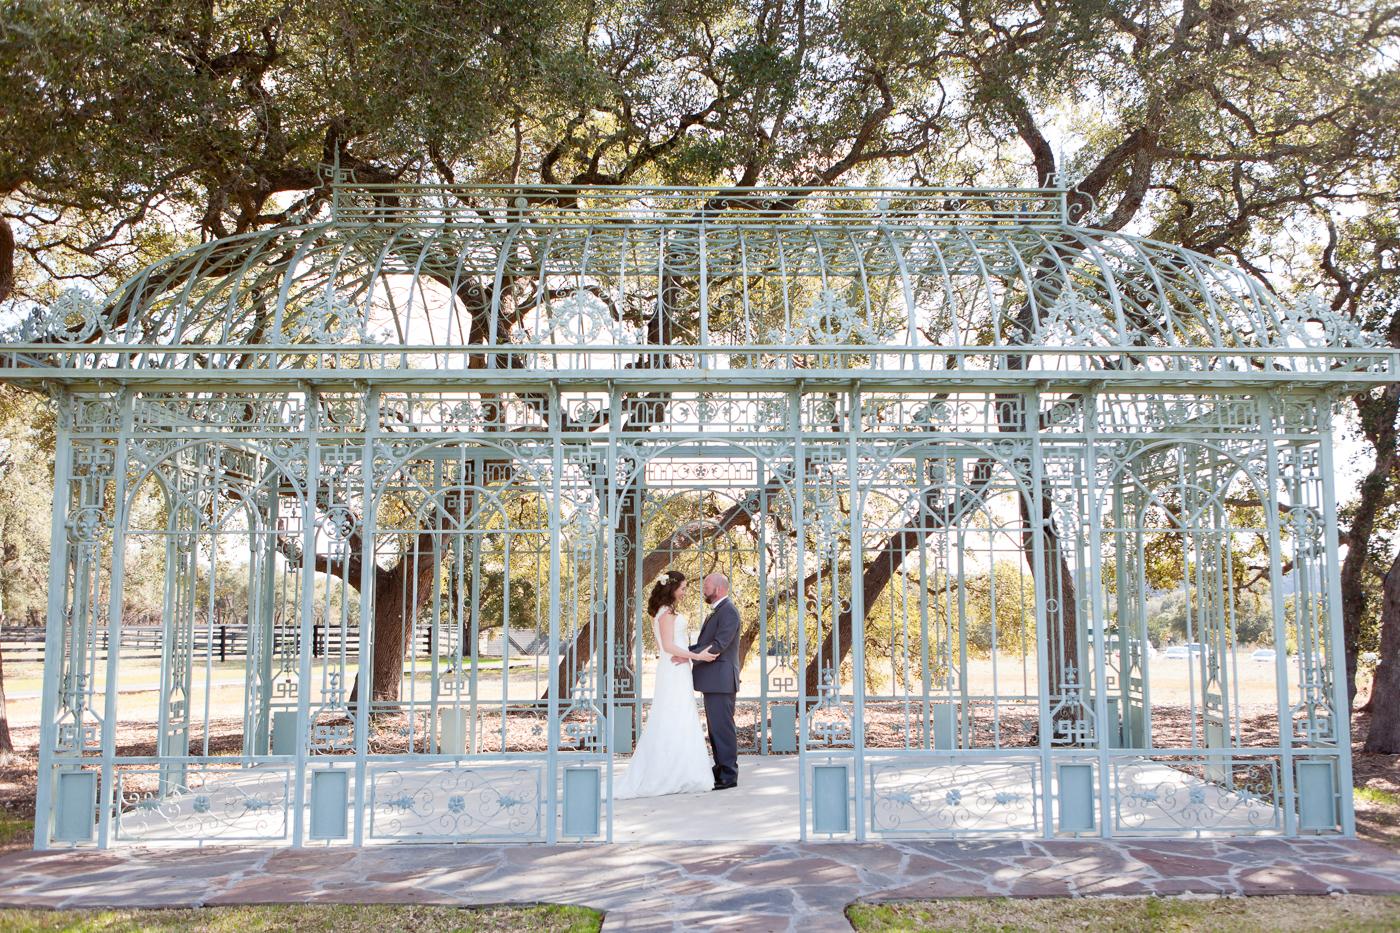 Austin-wedding-photo-and-video-011.jpg